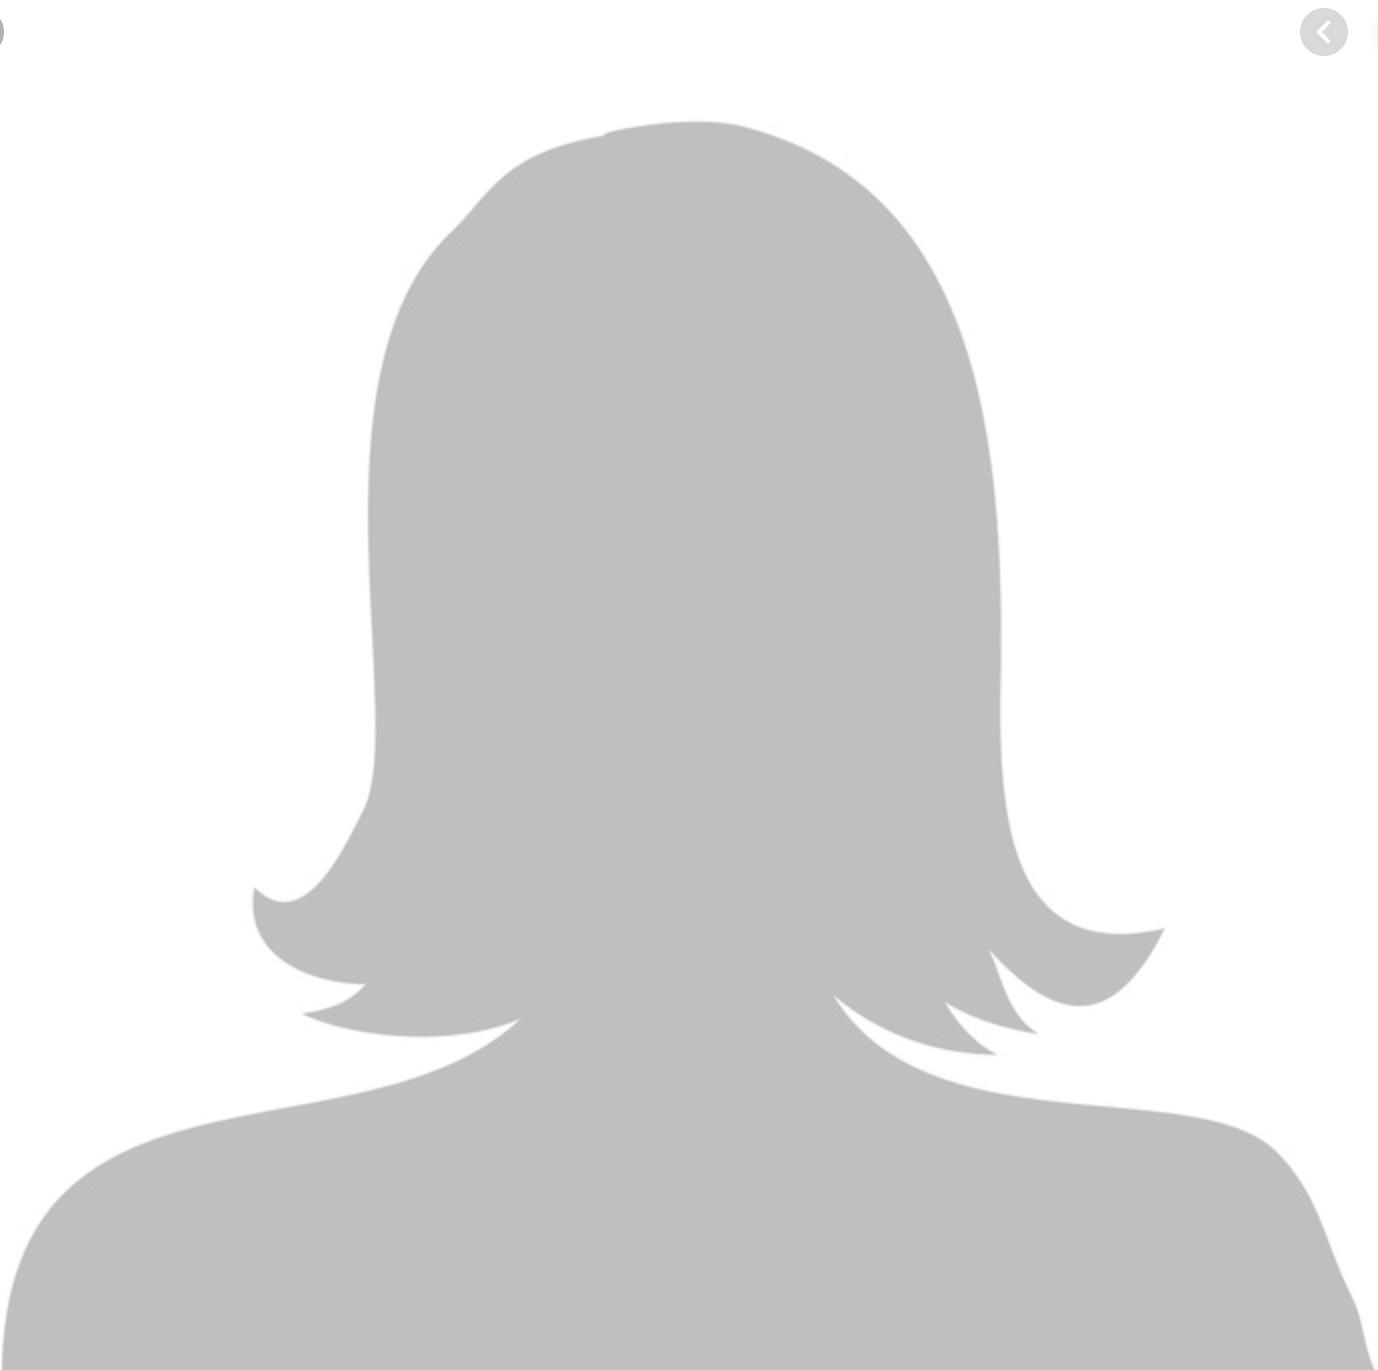 Linda Großschartner (Vorstand, Buchhaltung)